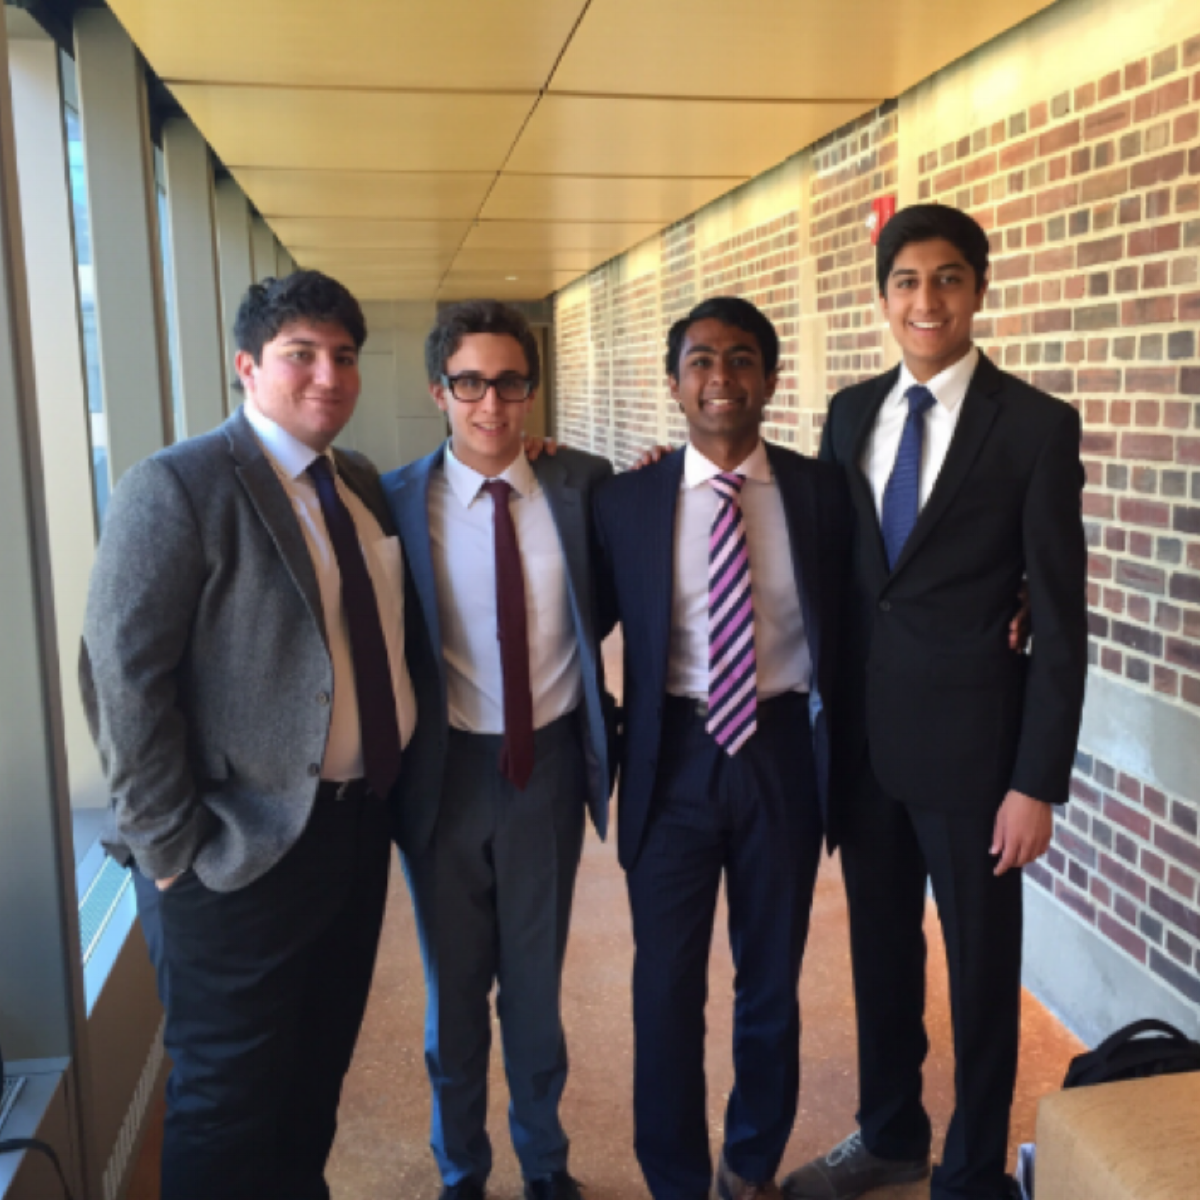 Congratulations to Dimitry Karavaikin, Satya Krishnan, Ananth Balasubramanian and Muftican Atalay on their winning solution!